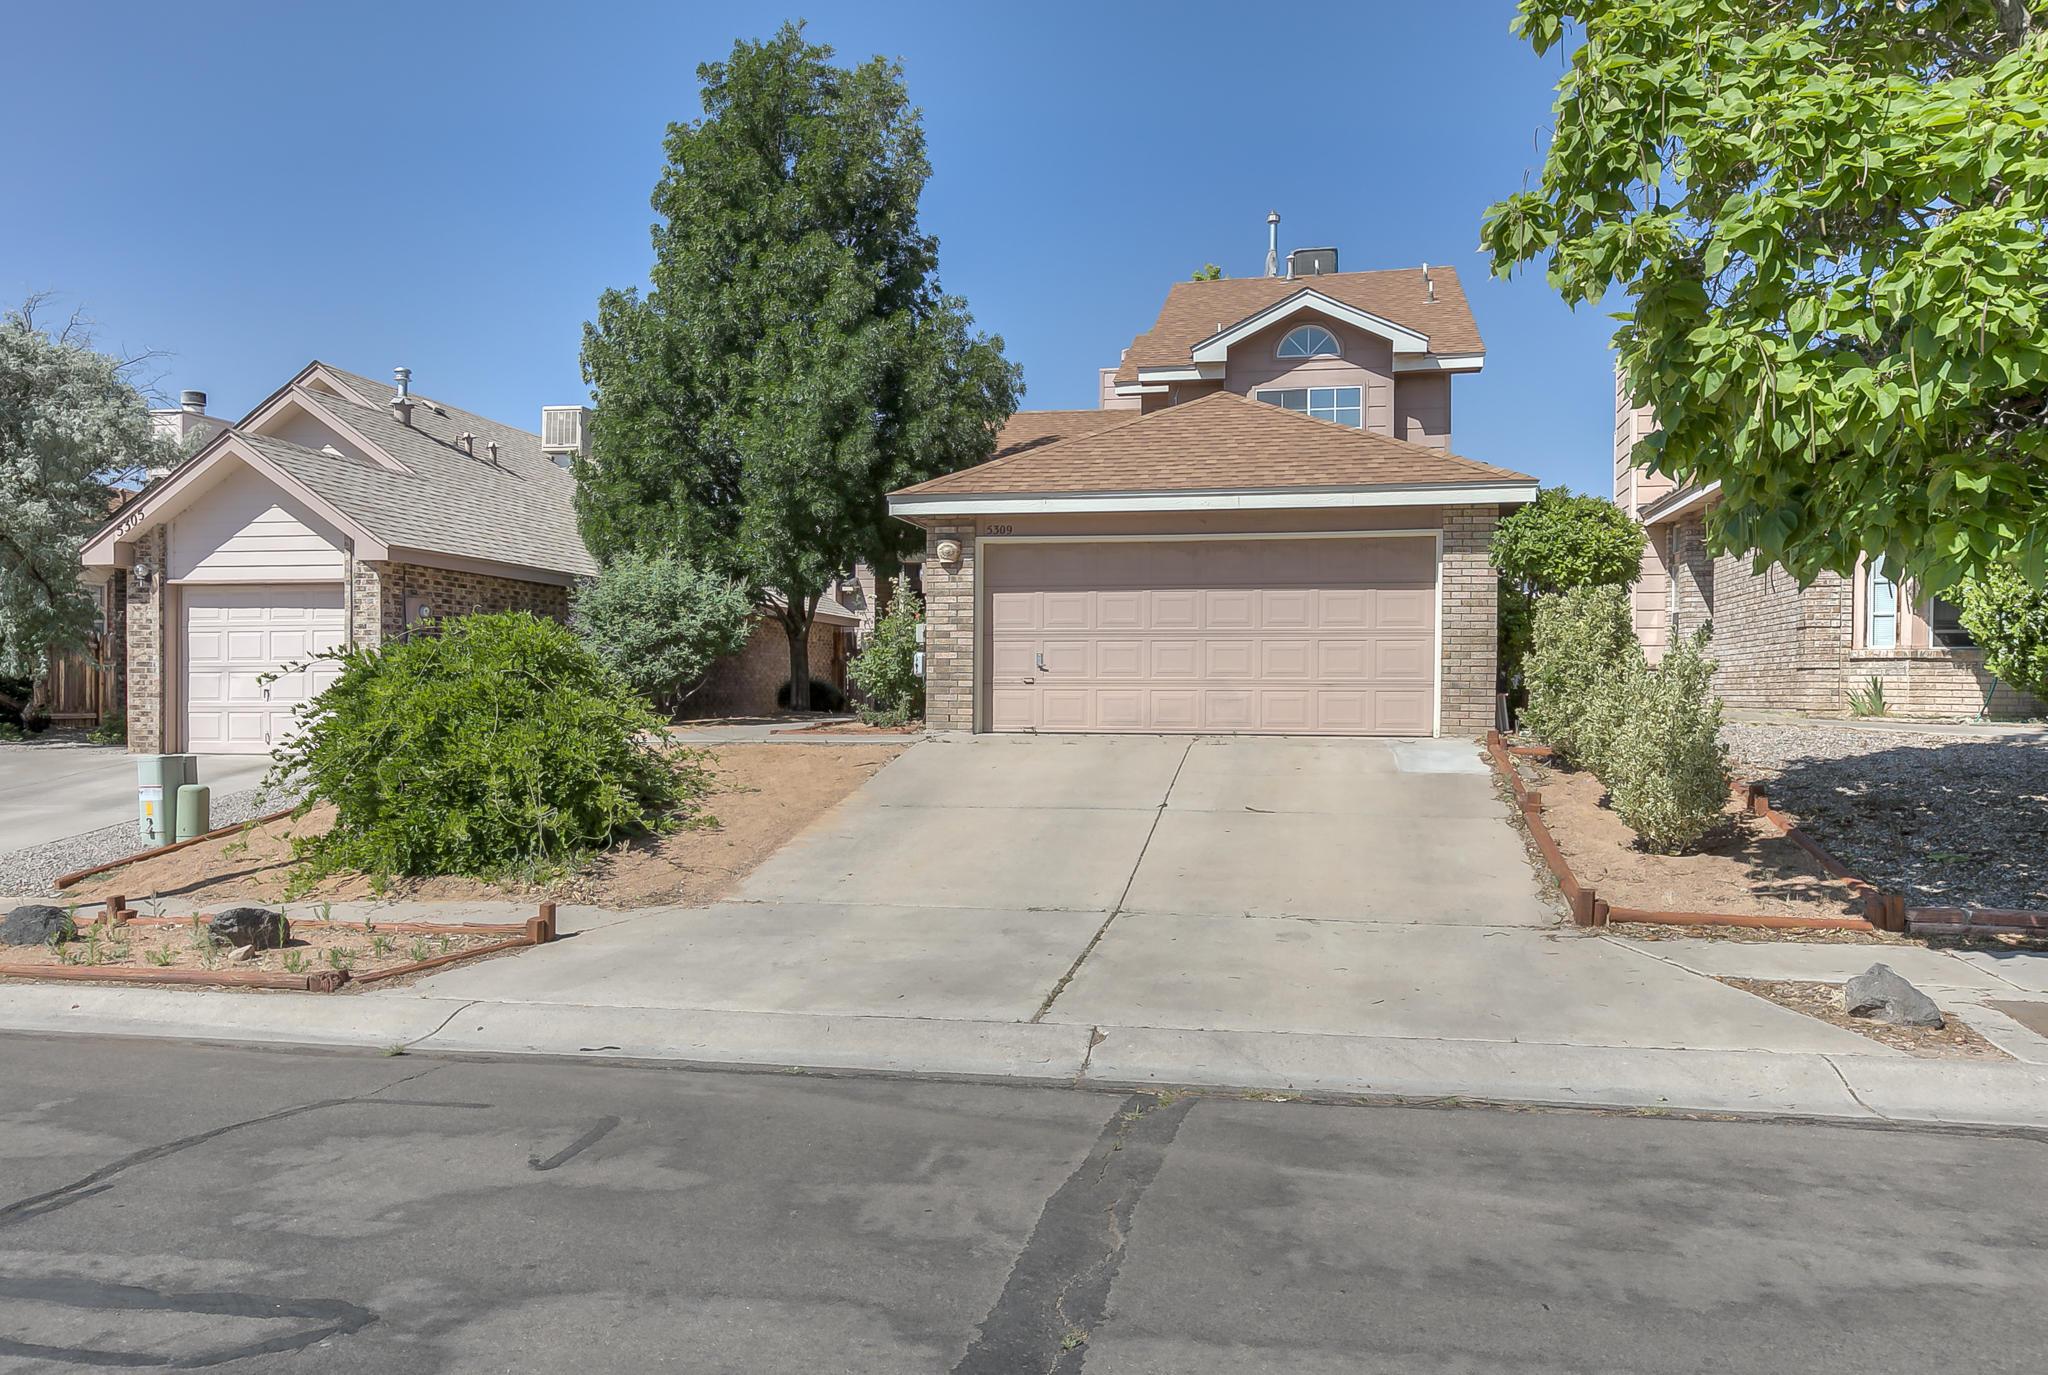 Photo of 5309 Bogart Street NW, Albuquerque, NM 87120